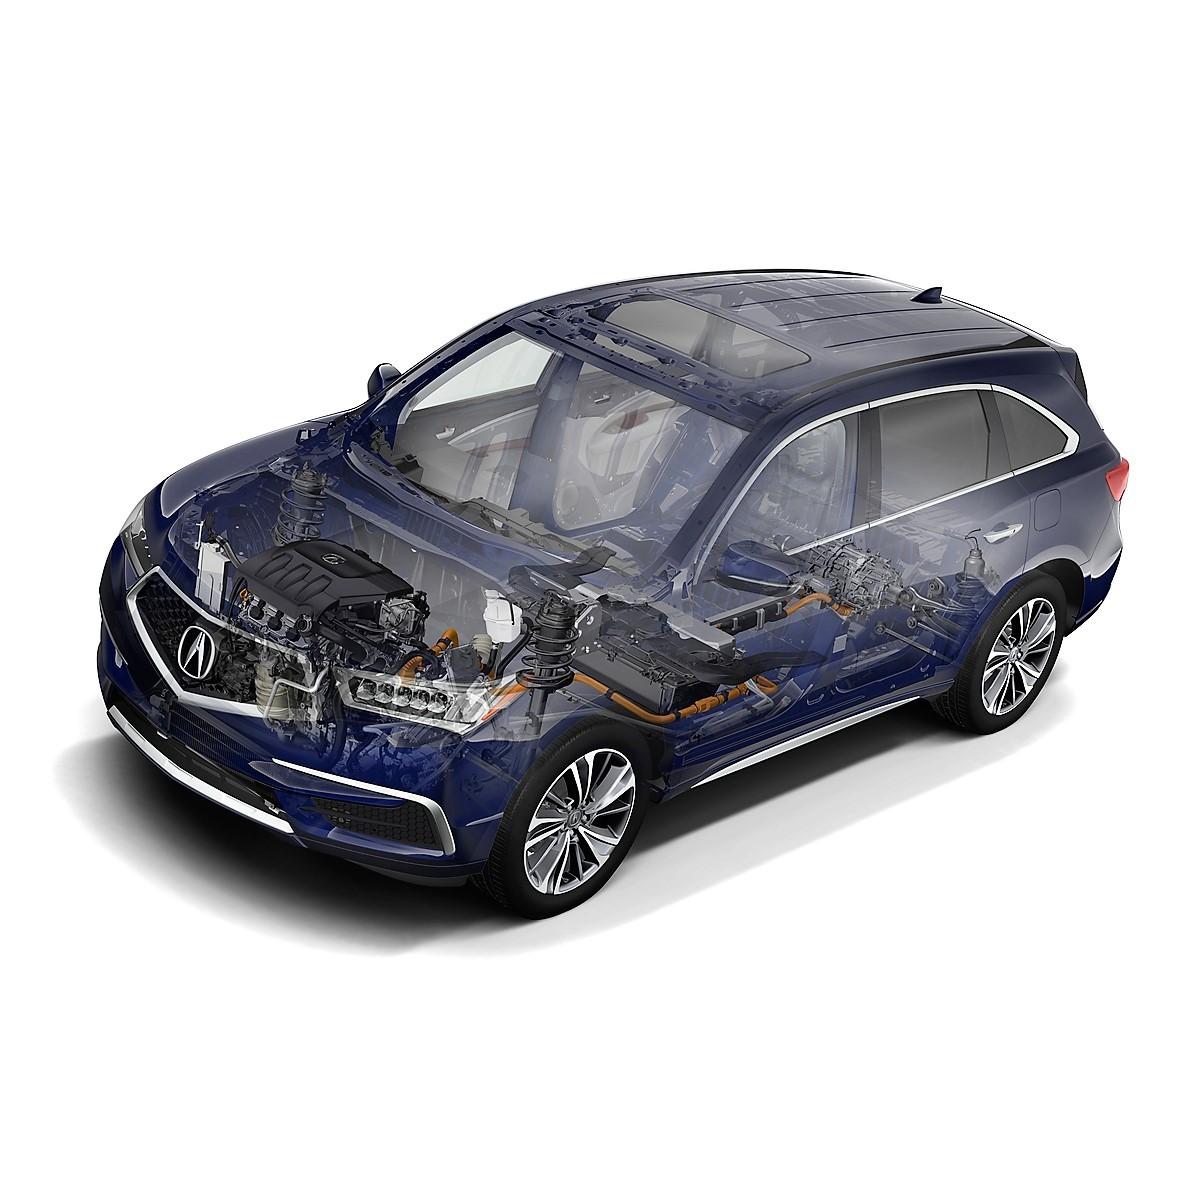 Road Test: 2017 Acura MDX Sport Hybrid